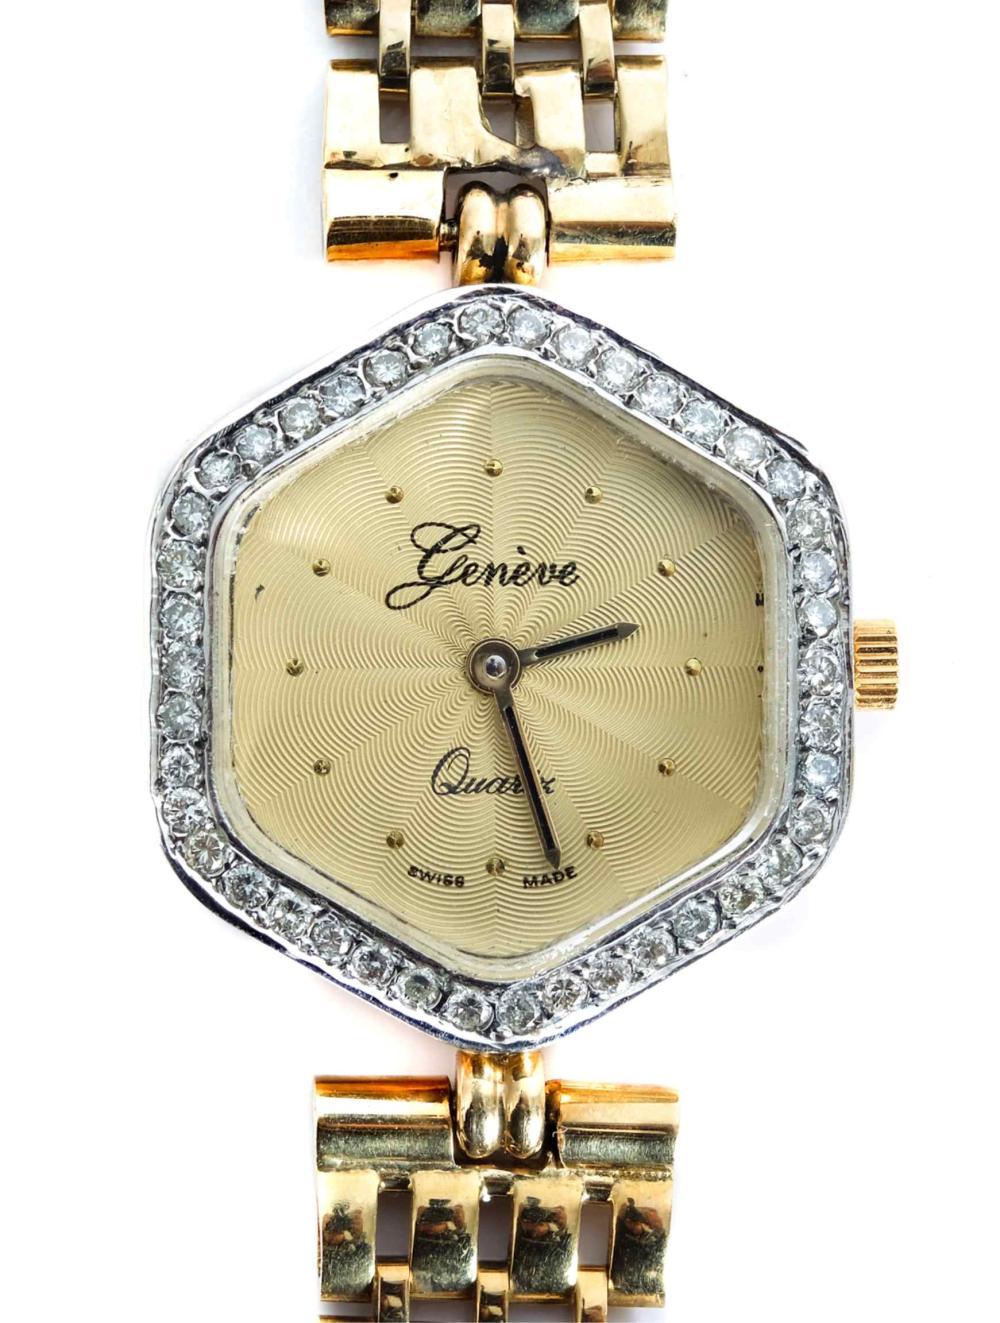 Vintage 14k Yellow Gold & Diamond Geneve Watch